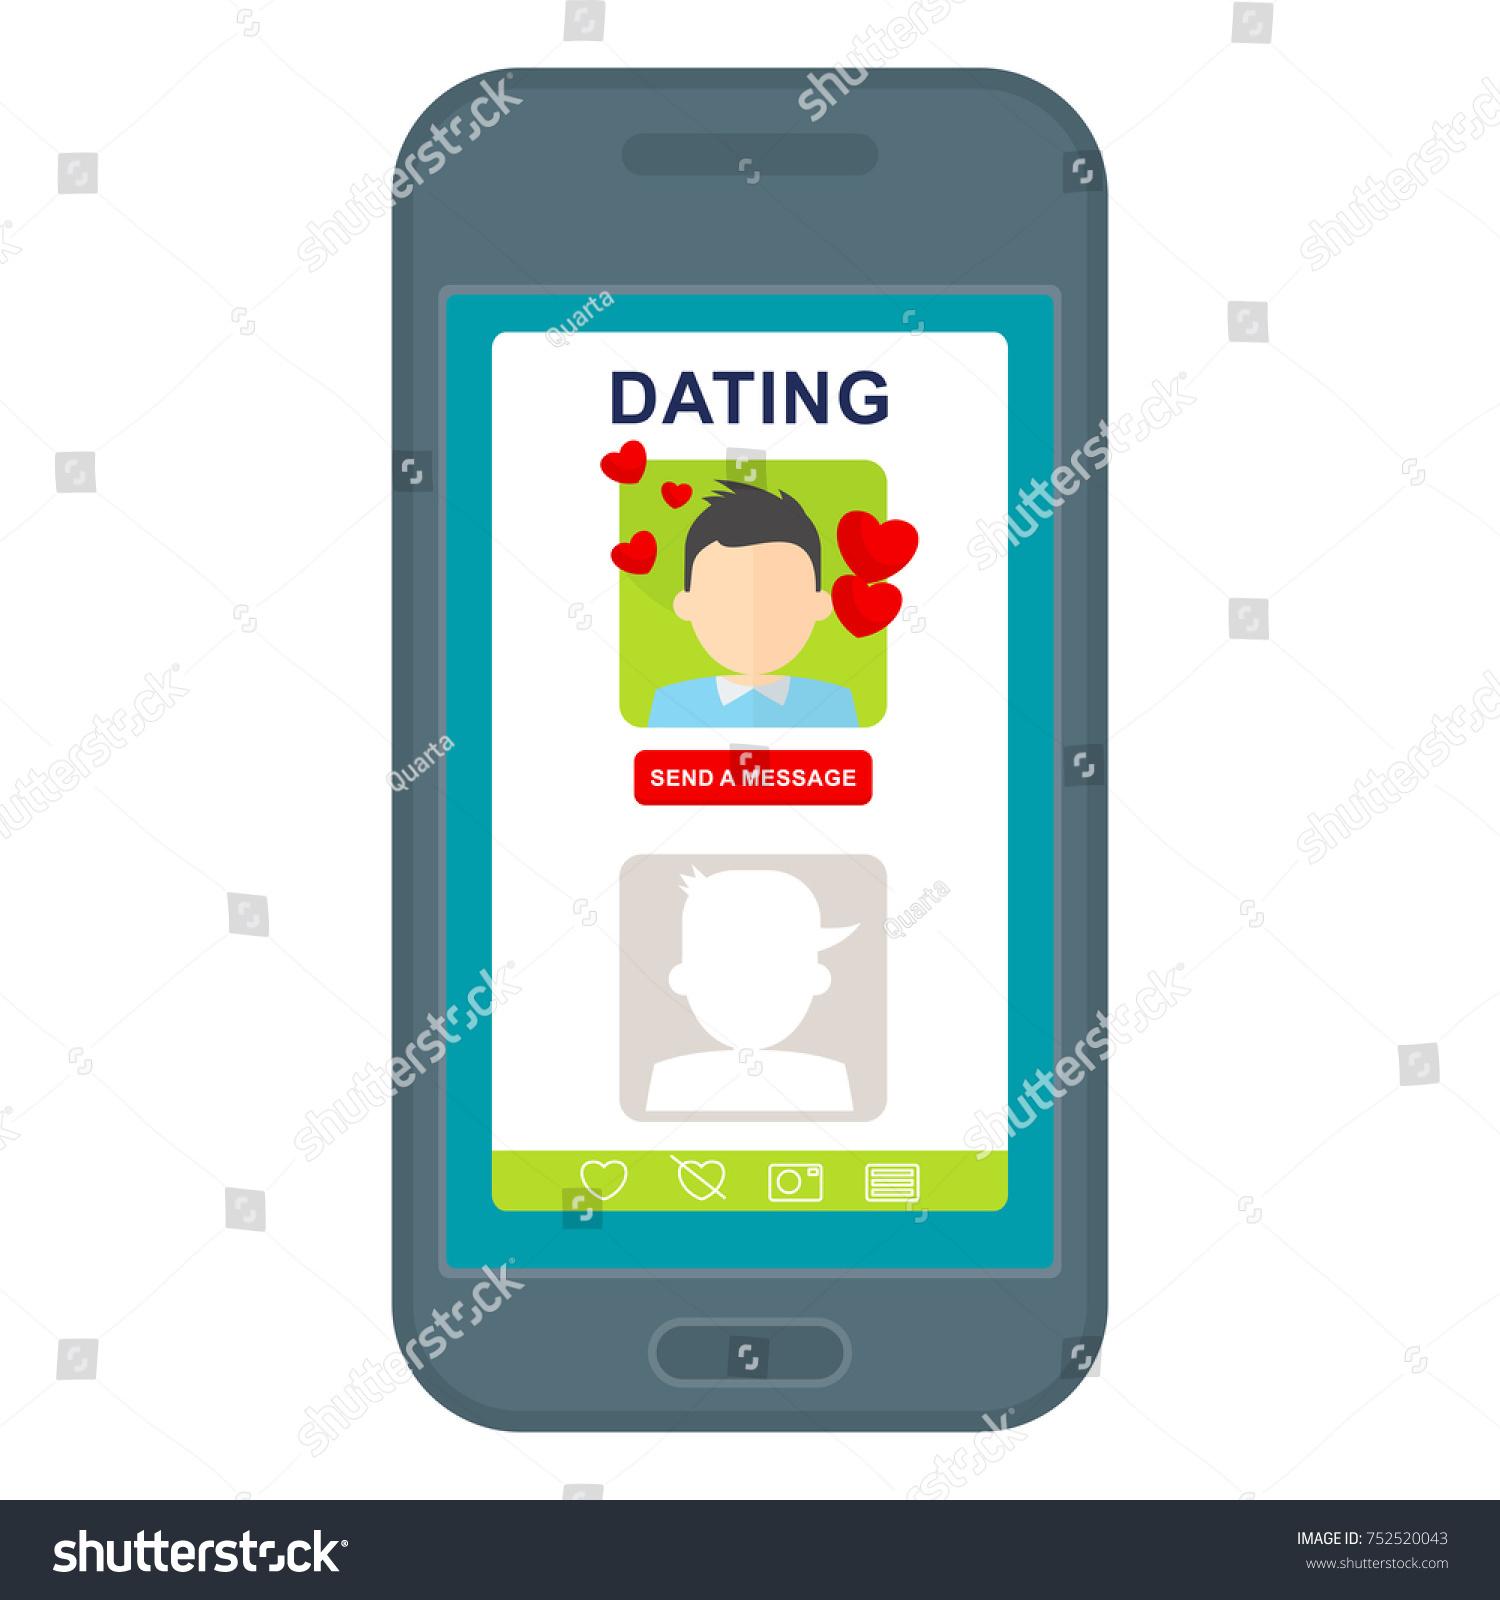 Dating application ideas